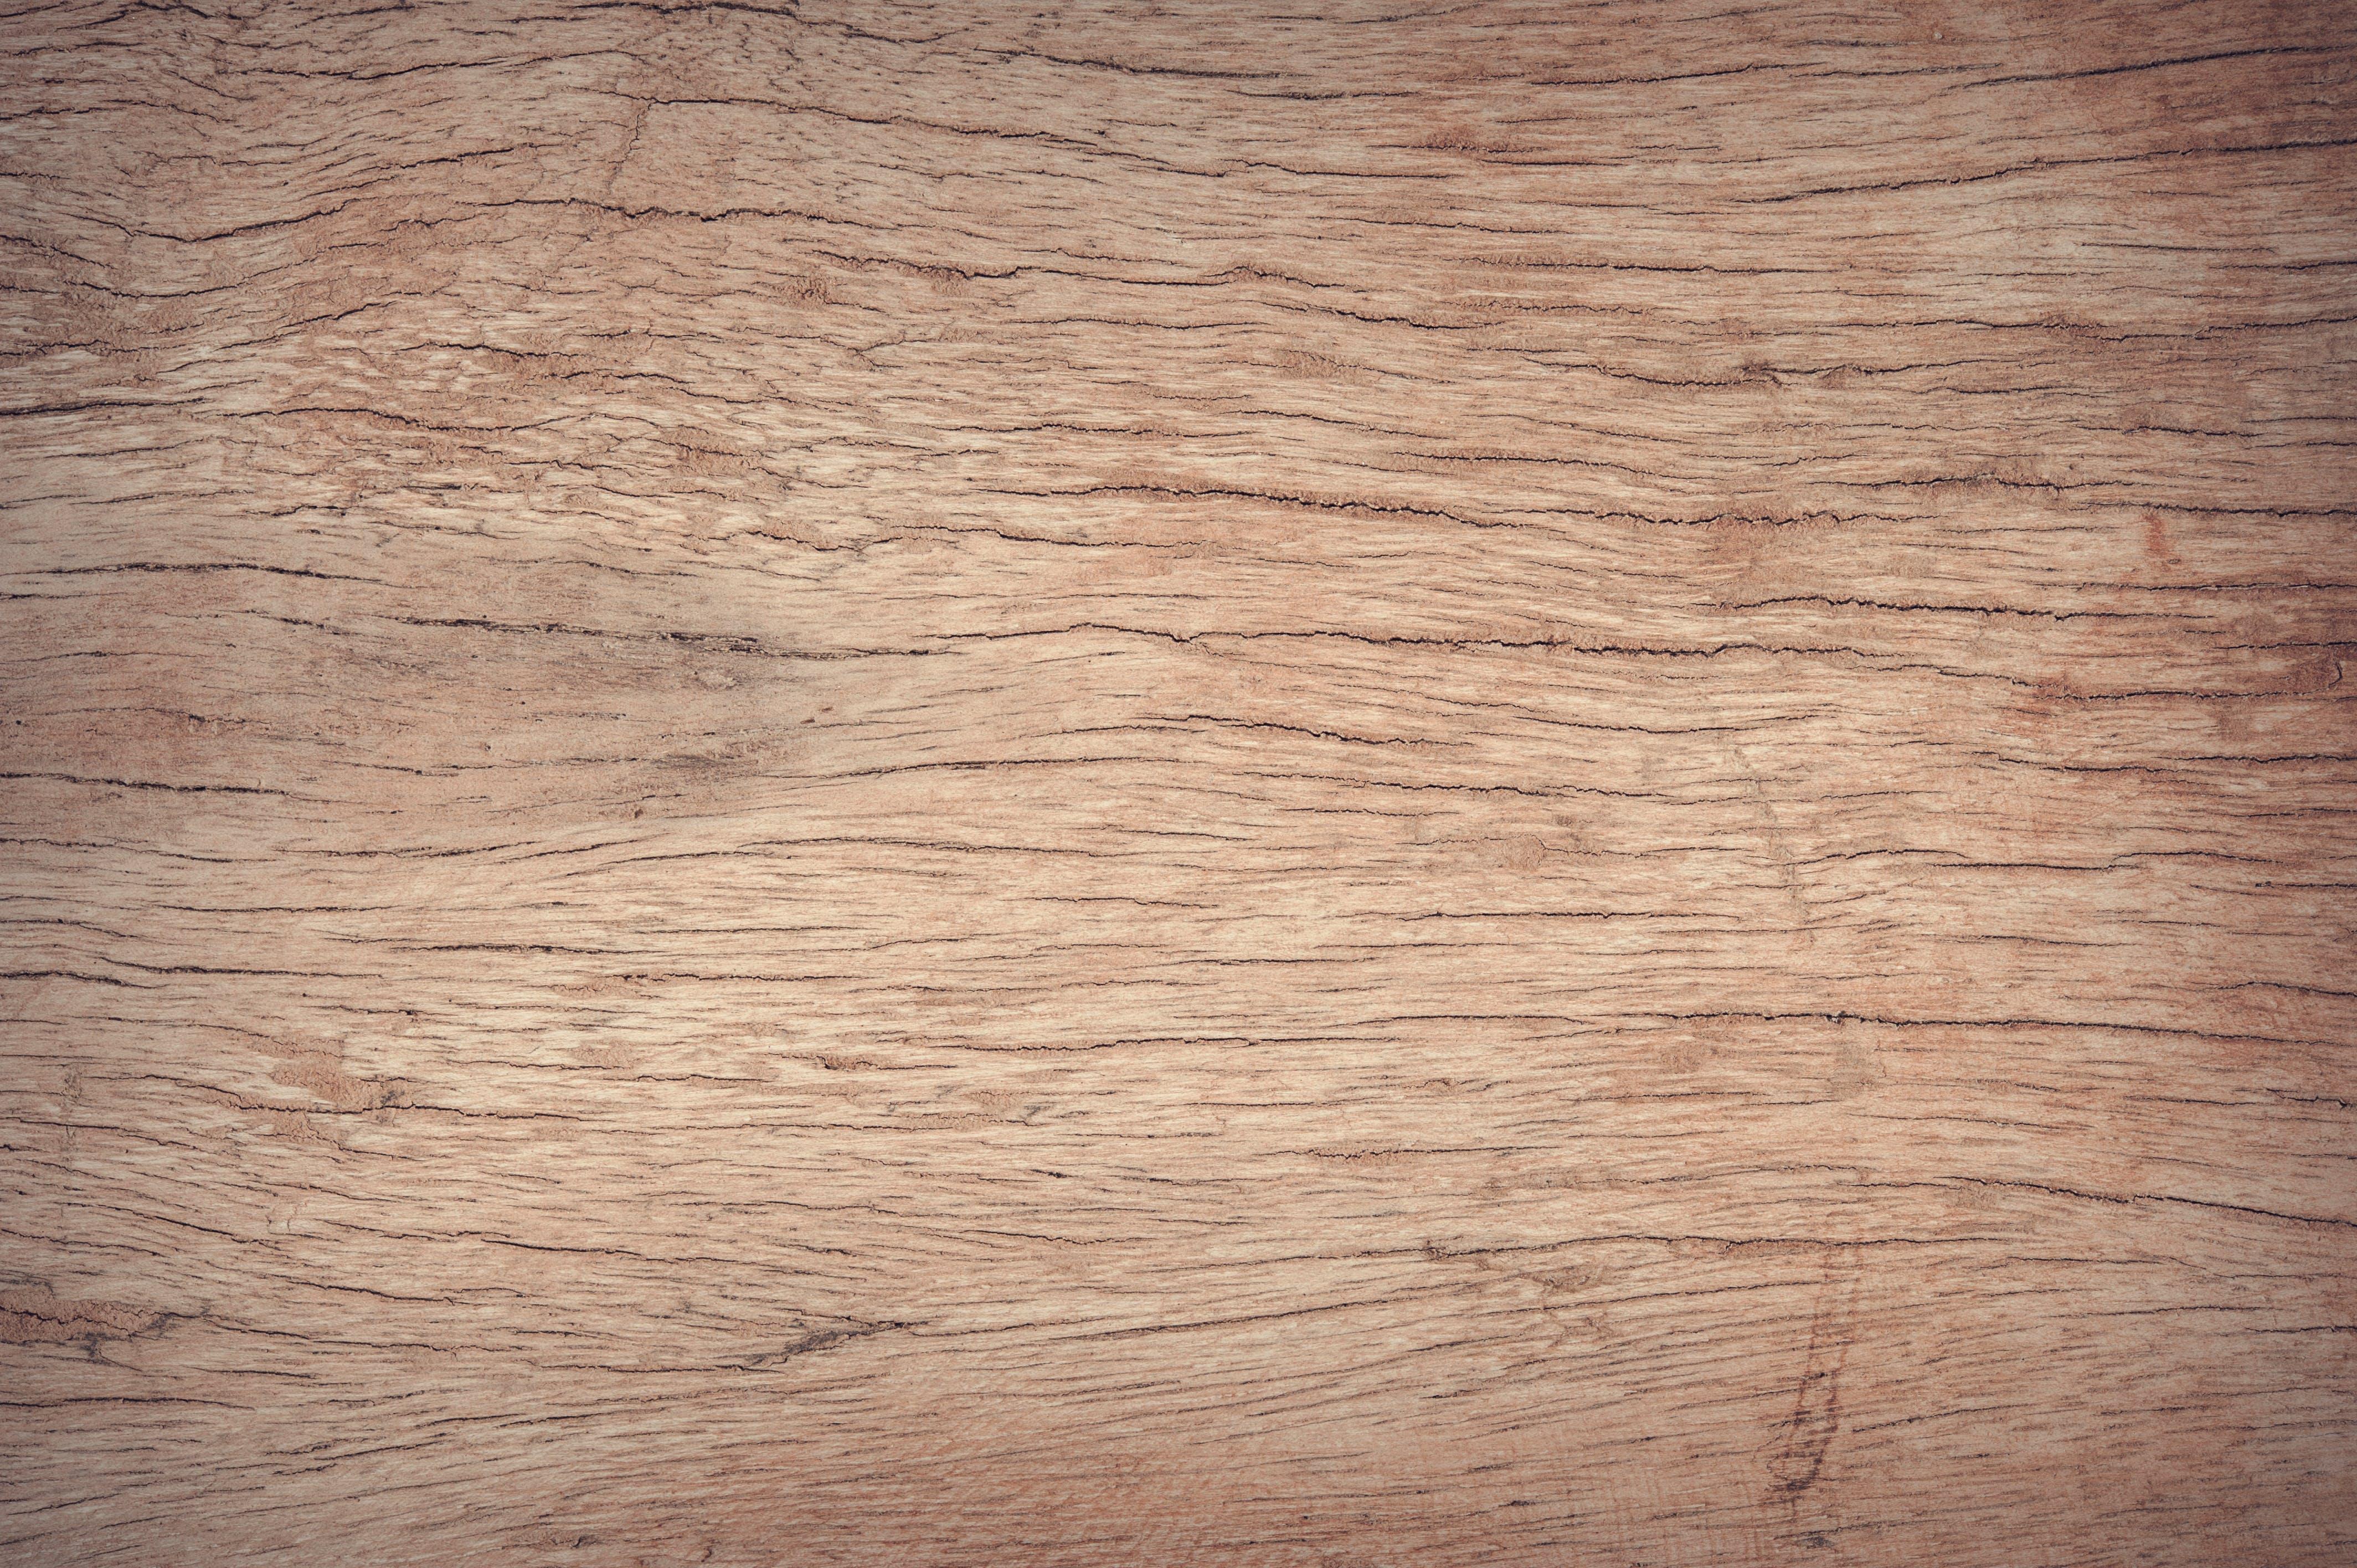 zu braun, brett, getrocknet, hartholz